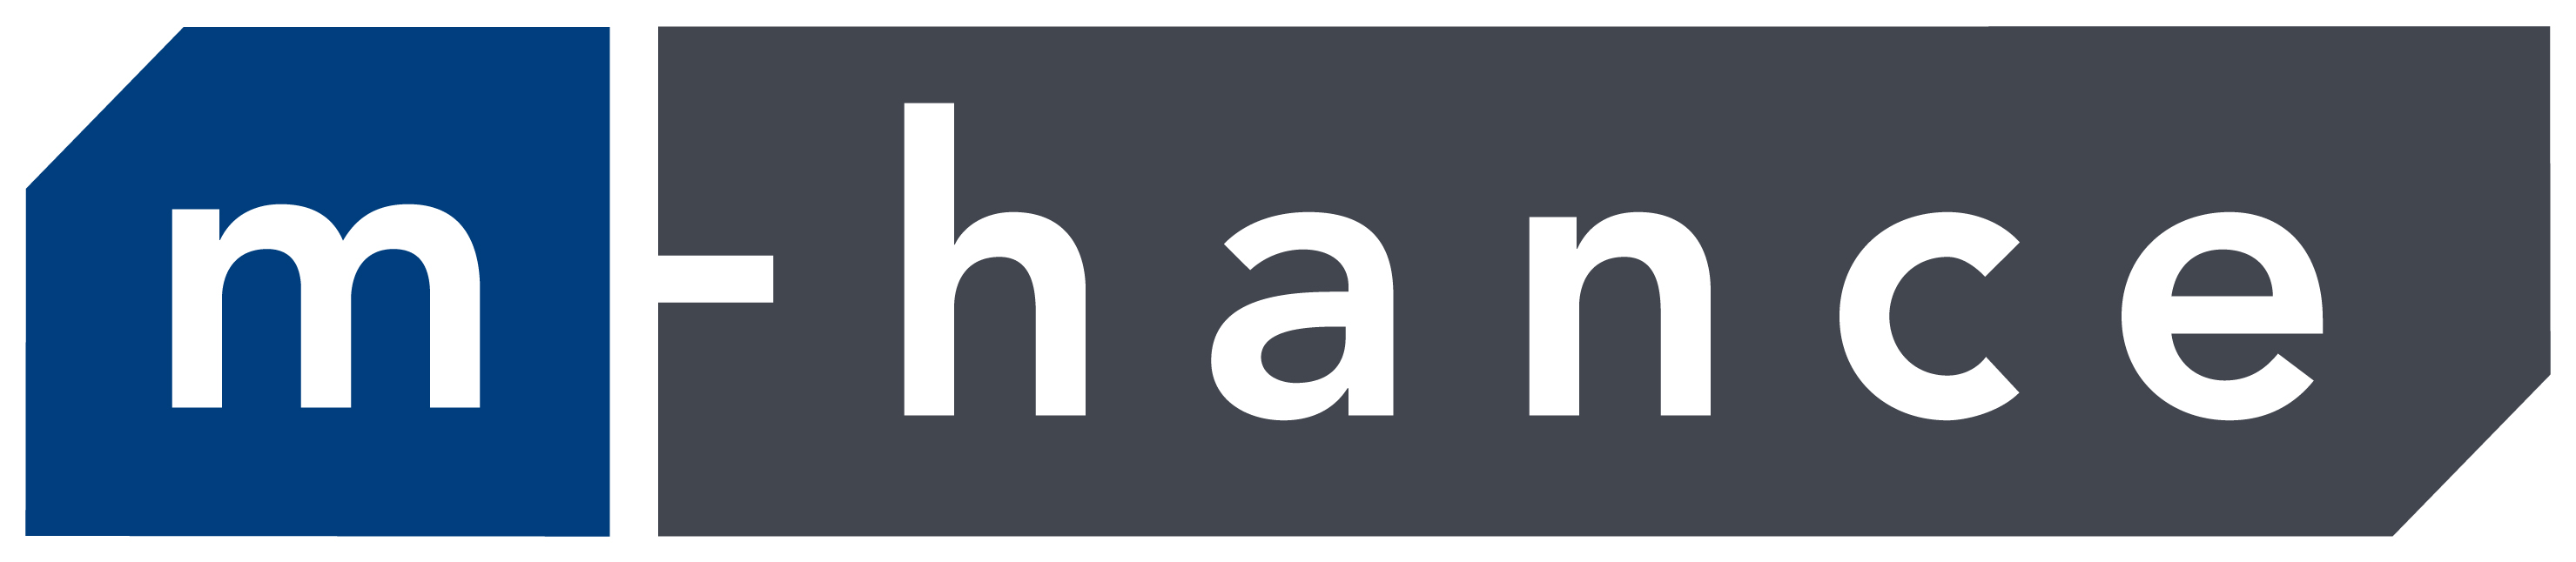 Index of /marketplace/wp-content/uploads